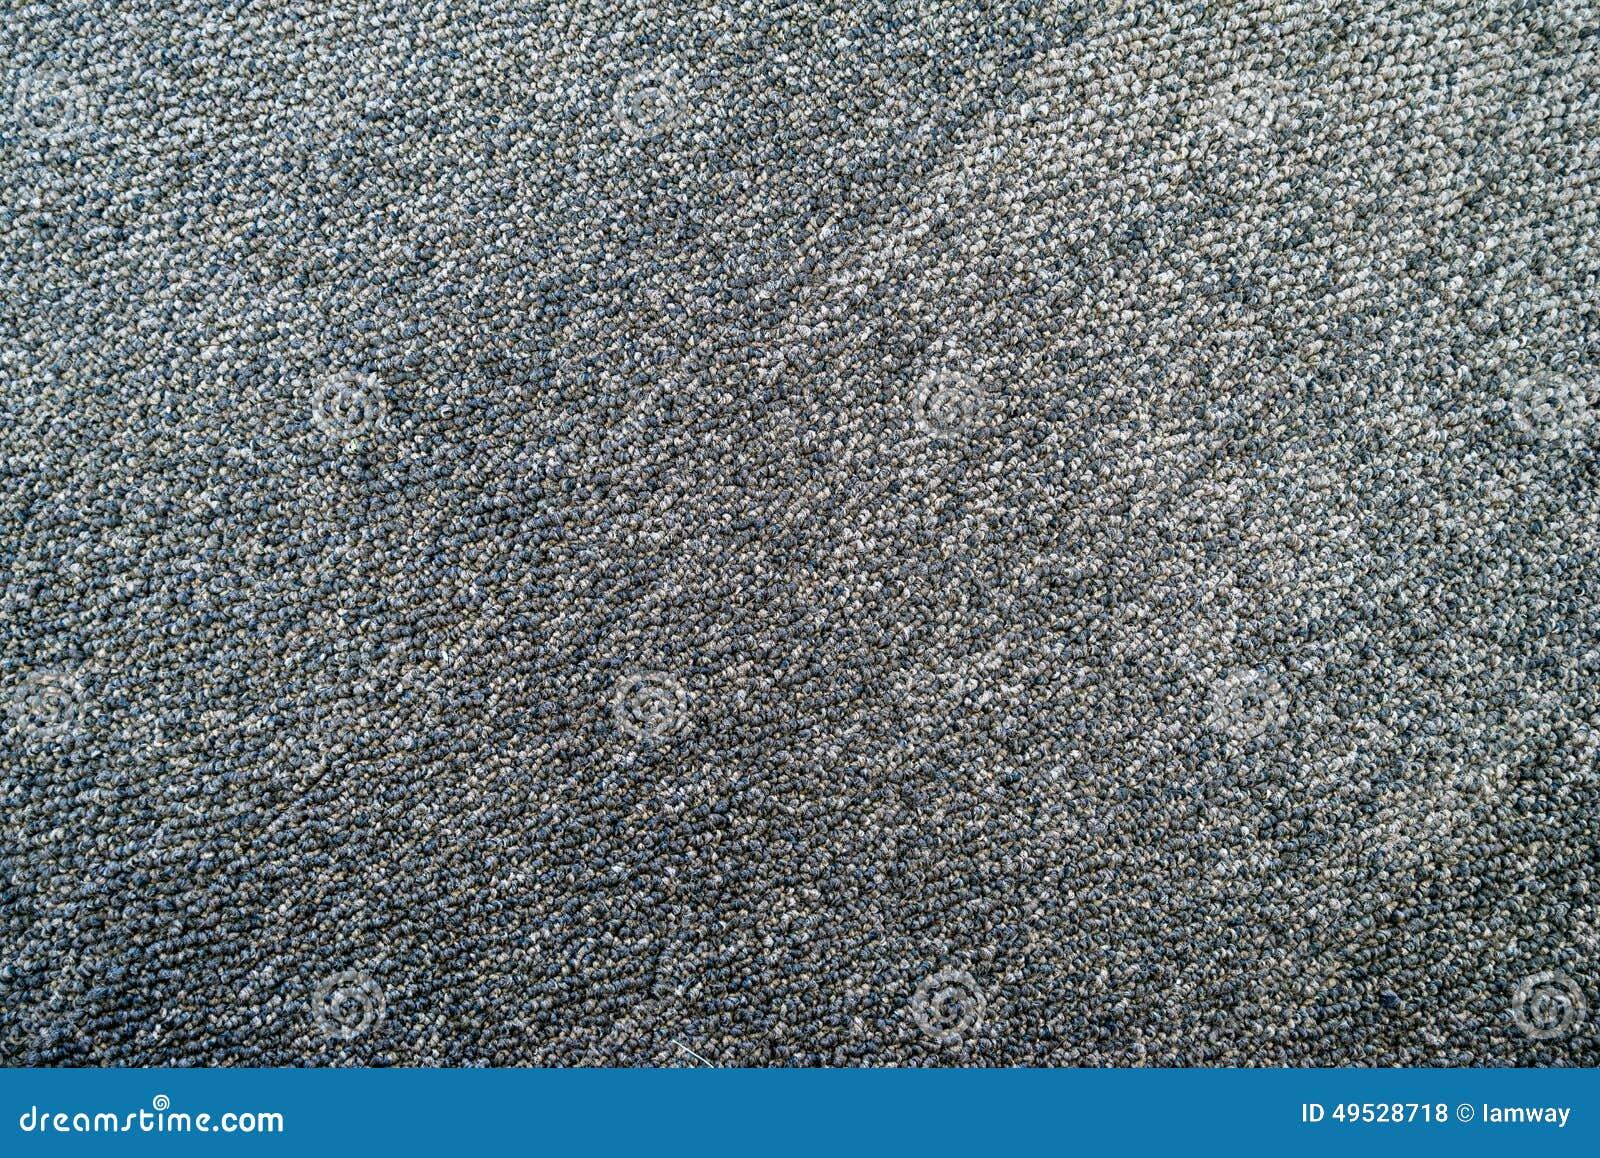 High quality soft carpet fine grain stock photo image for High resolution carpet images